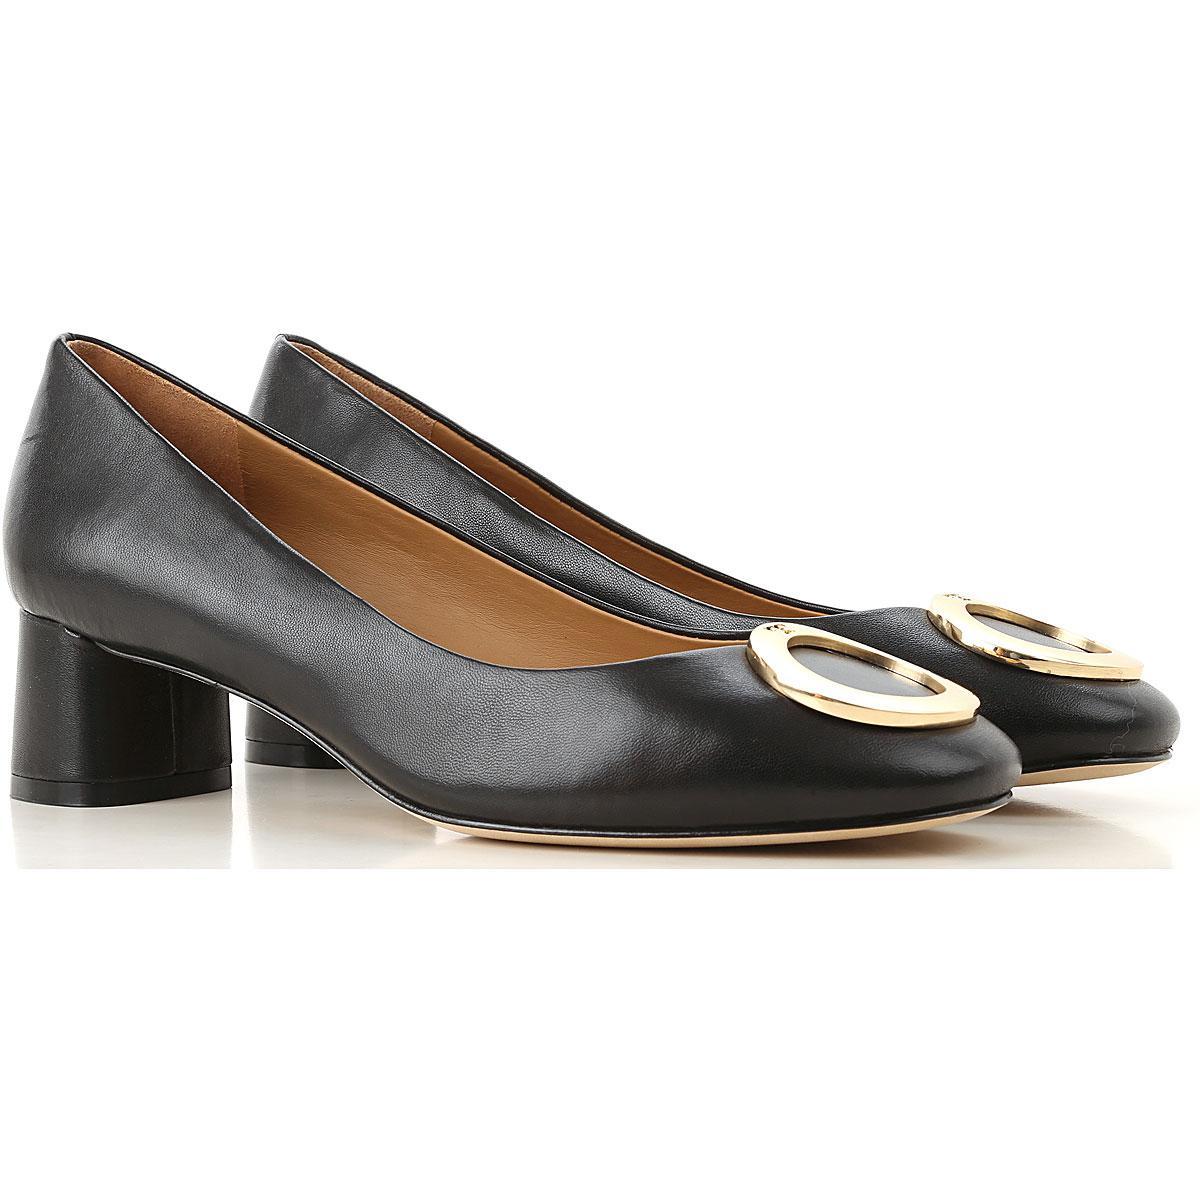 21d7da99e29 Lyst - Tory Burch Pumps   High Heels For Women in Black